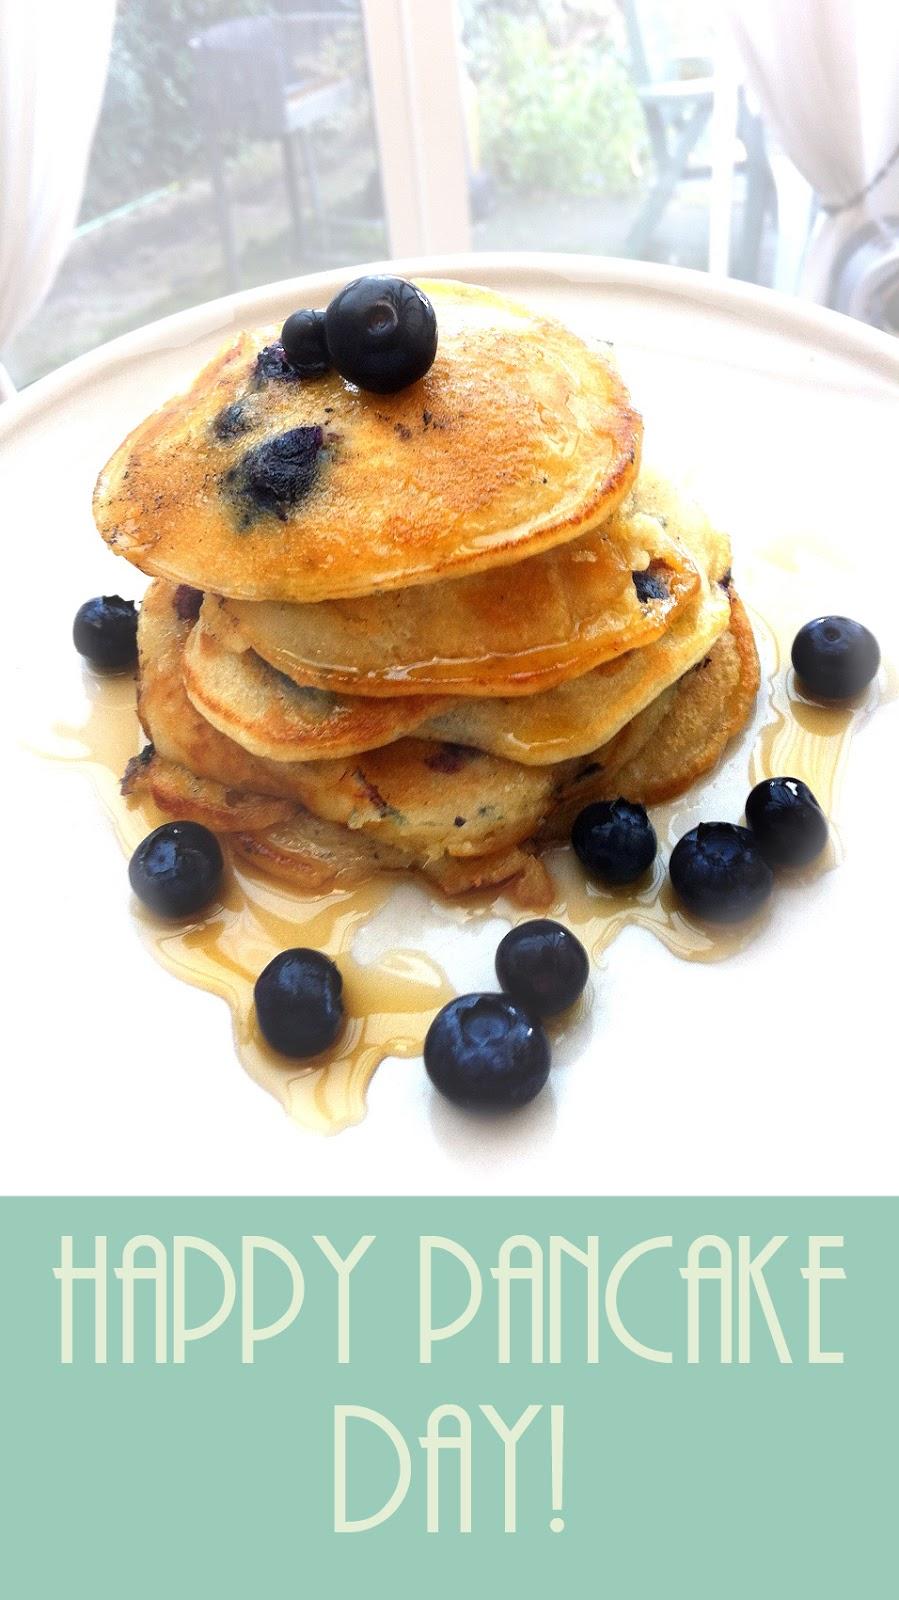 The Veganoid: Happy Pancake Day!